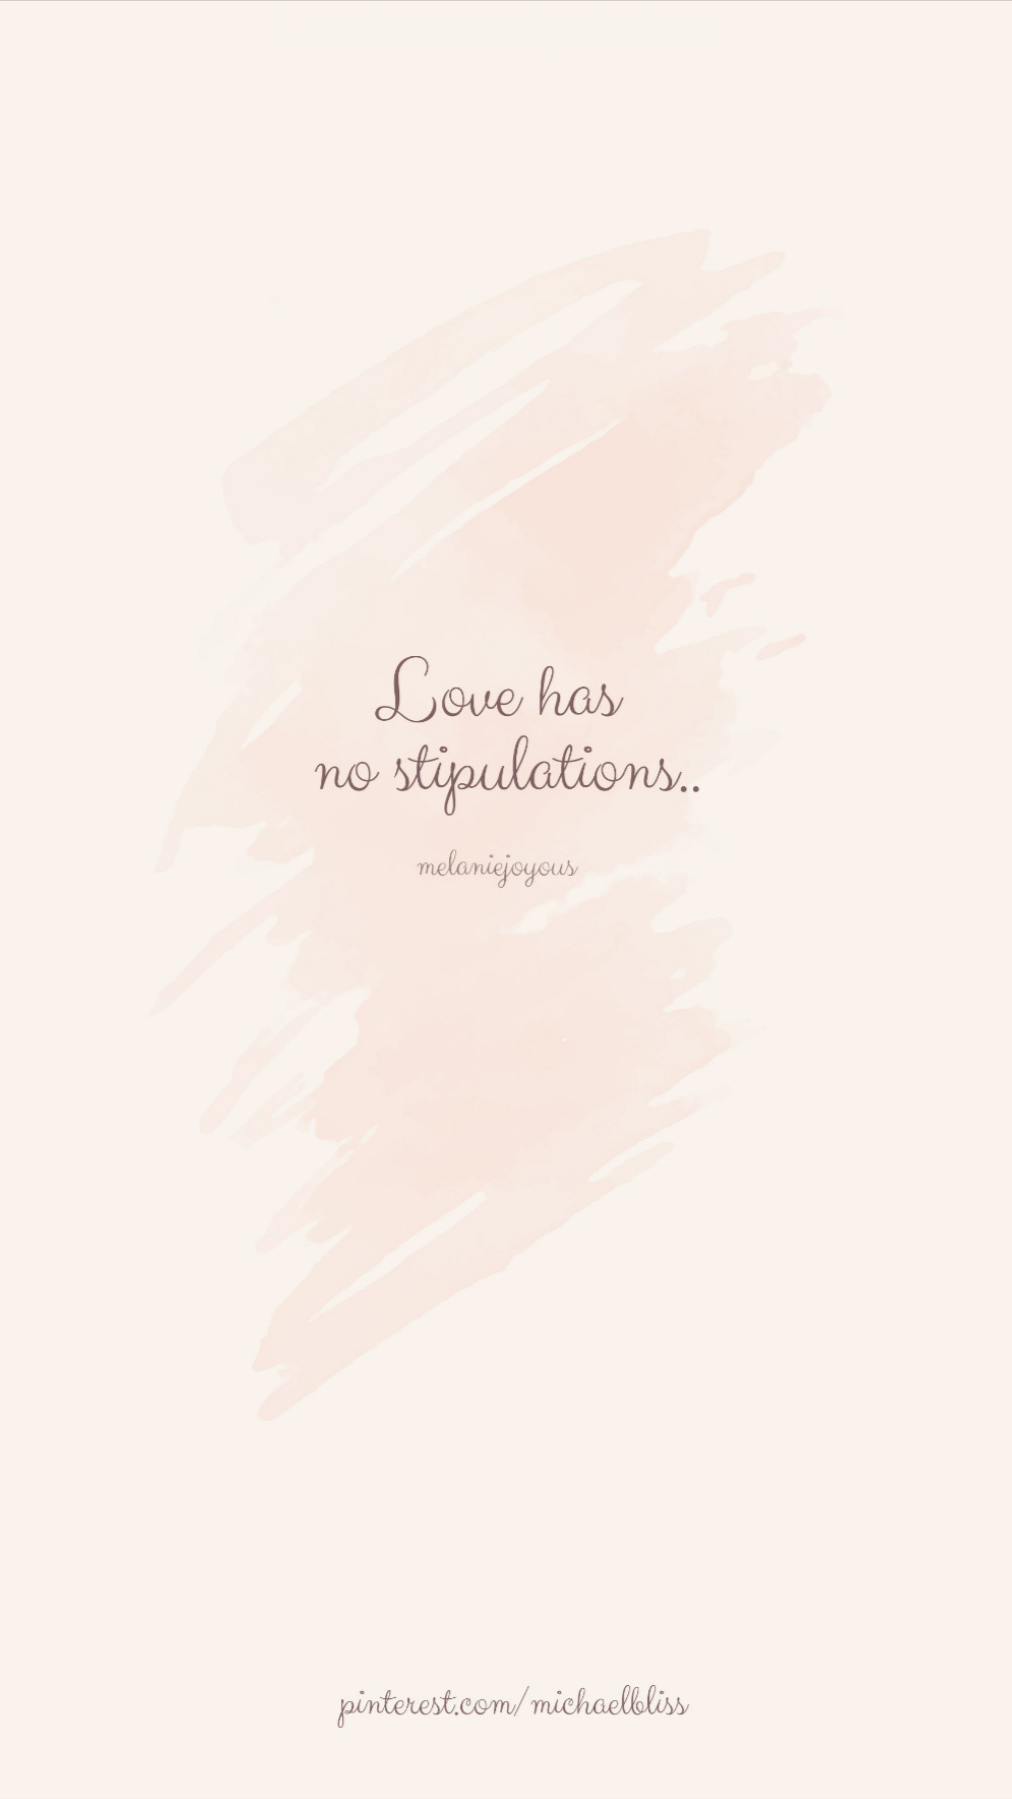 Love has no stipulations